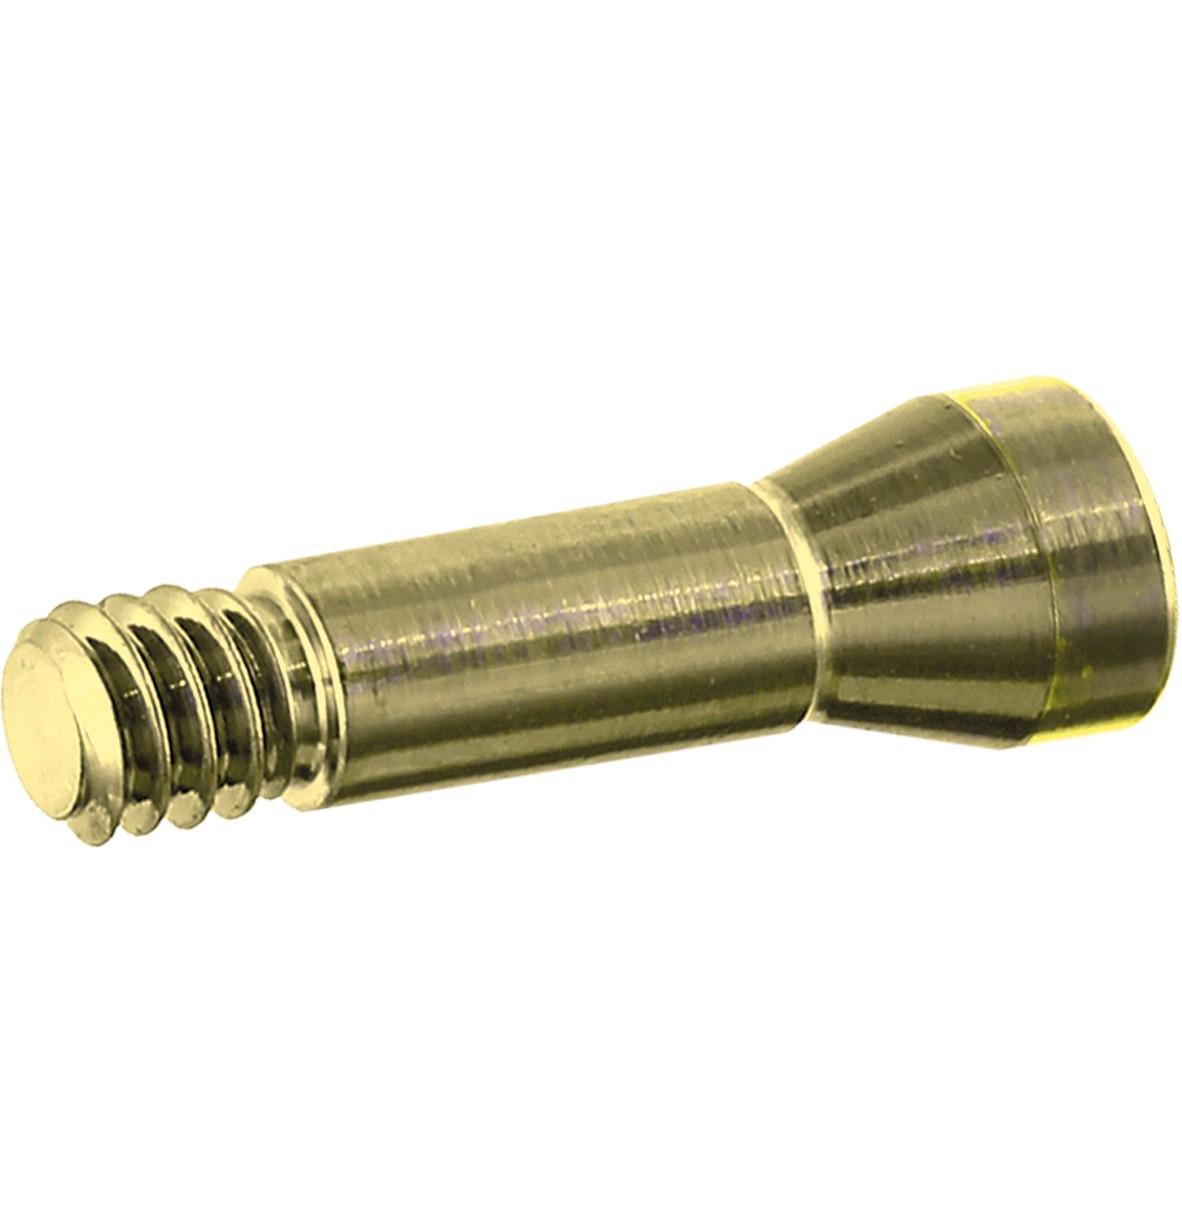 BL NC Basisschraube (CAD/CAM)